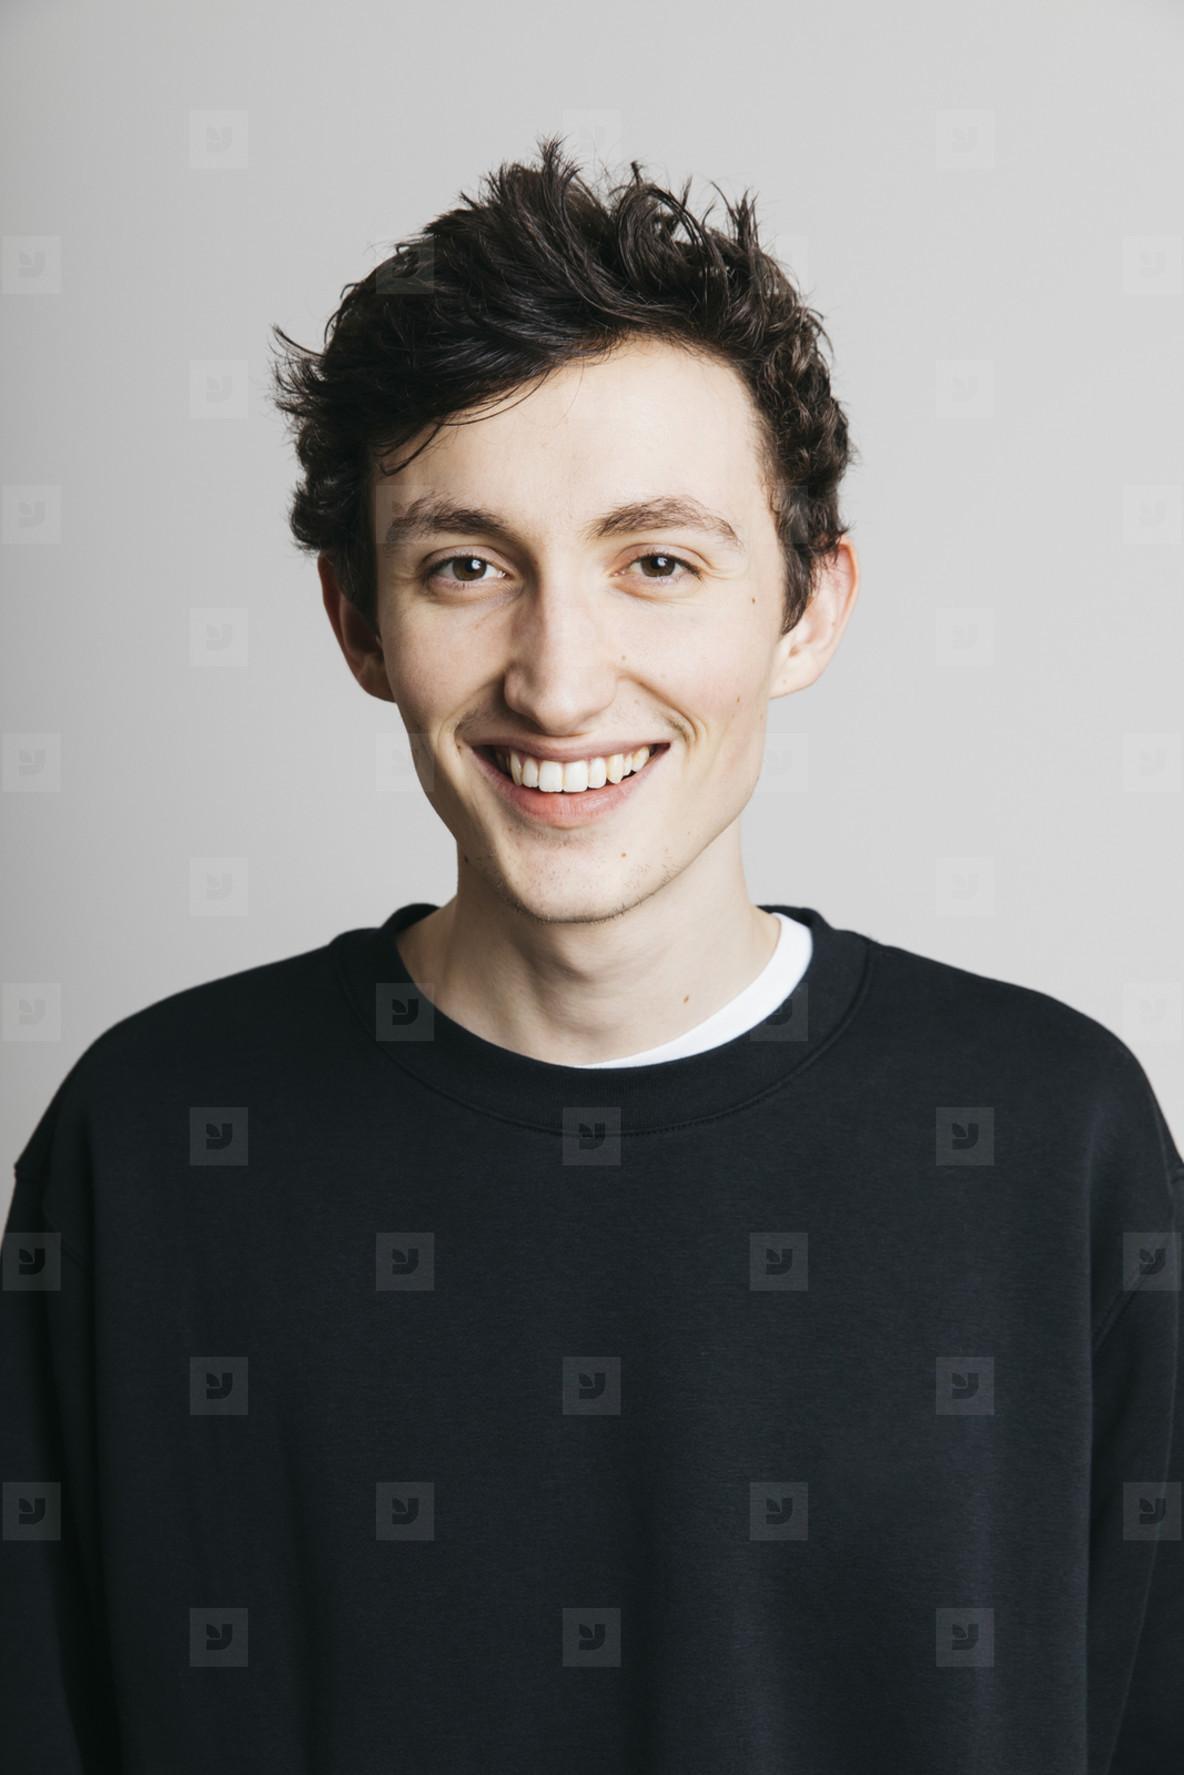 Portrait smiling young brunette man